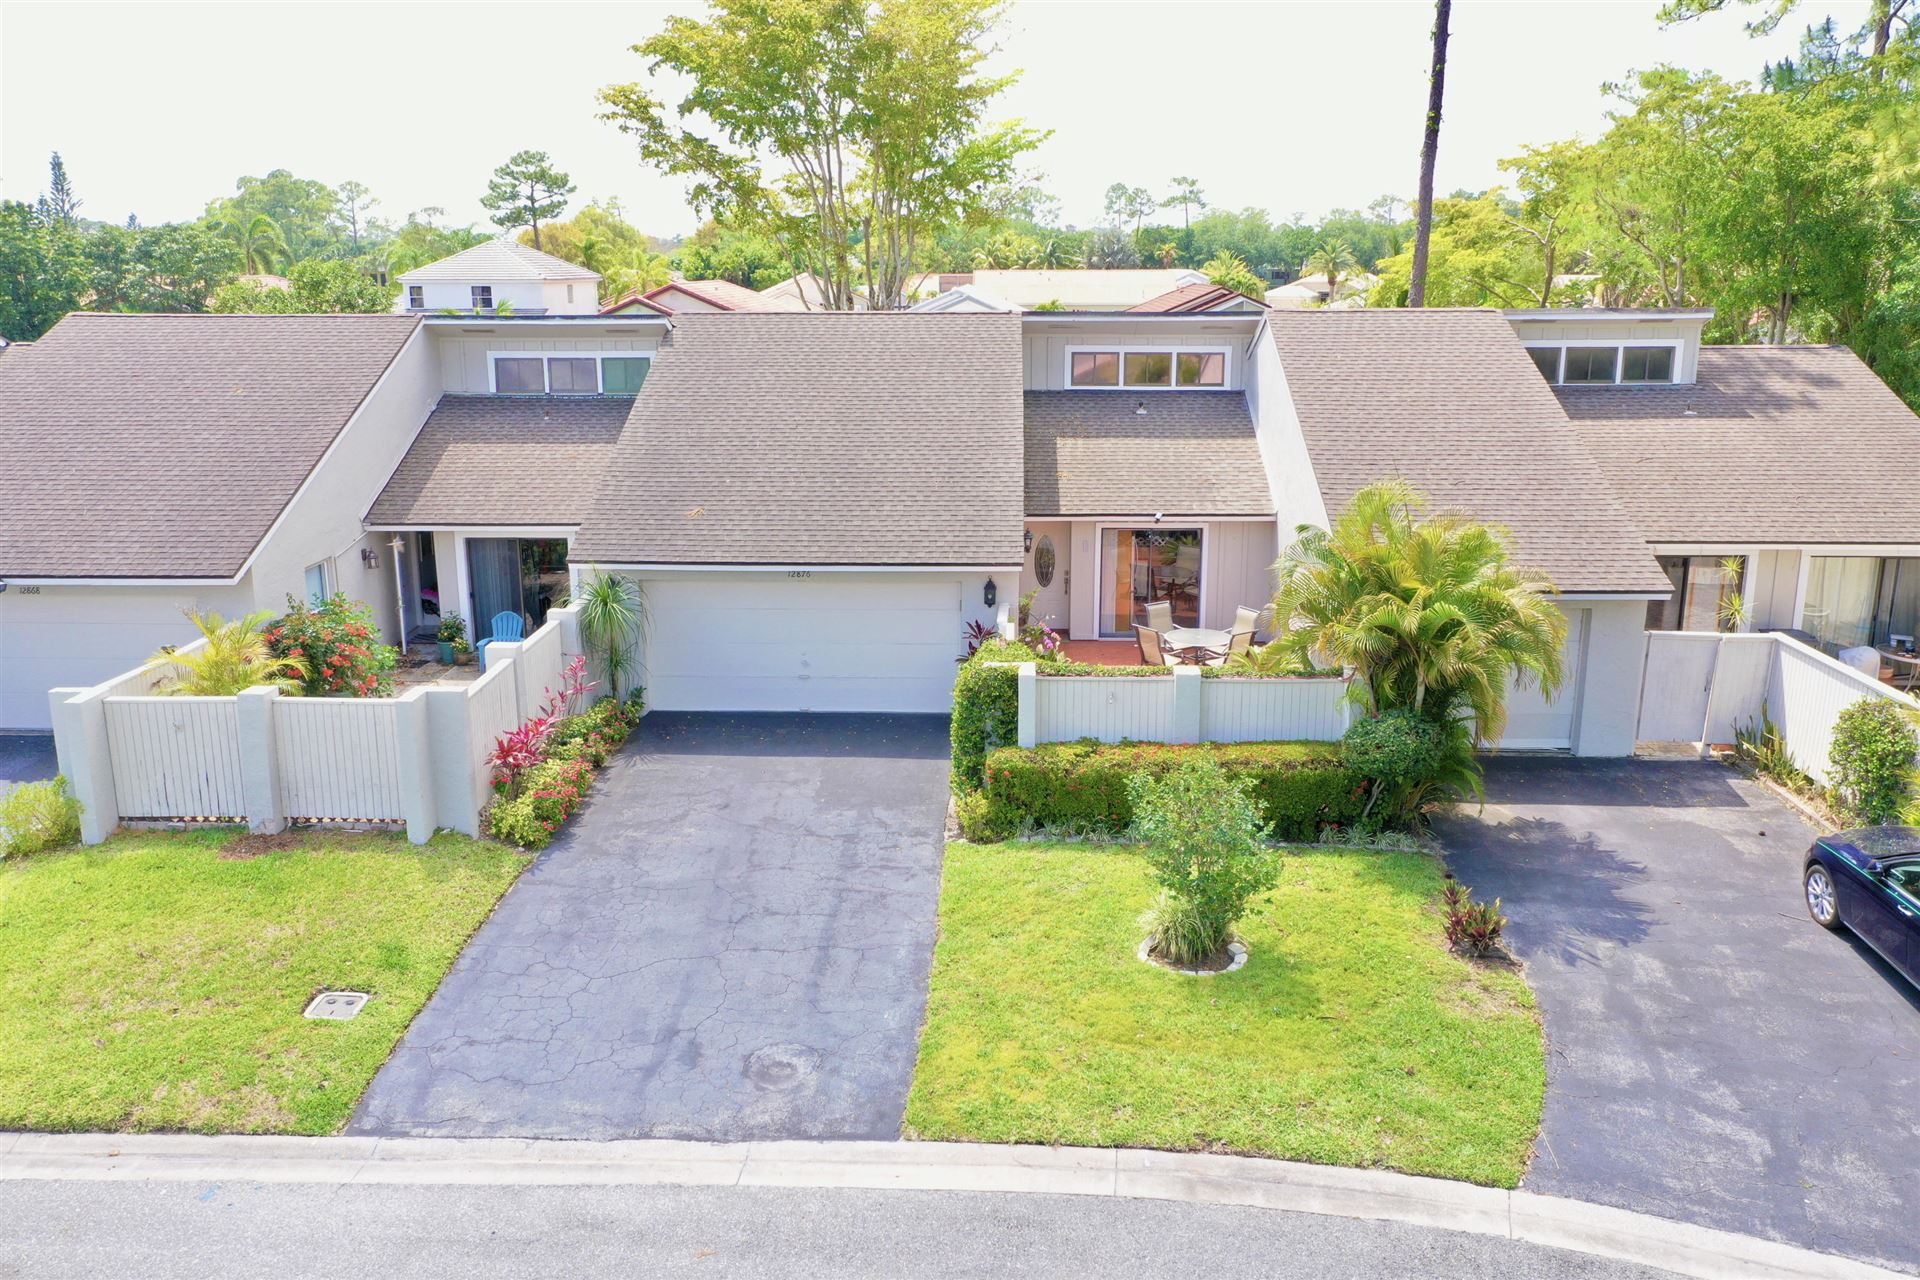 Photo of 12876 Spinnaker Lane, Wellington, FL 33414 (MLS # RX-10709750)